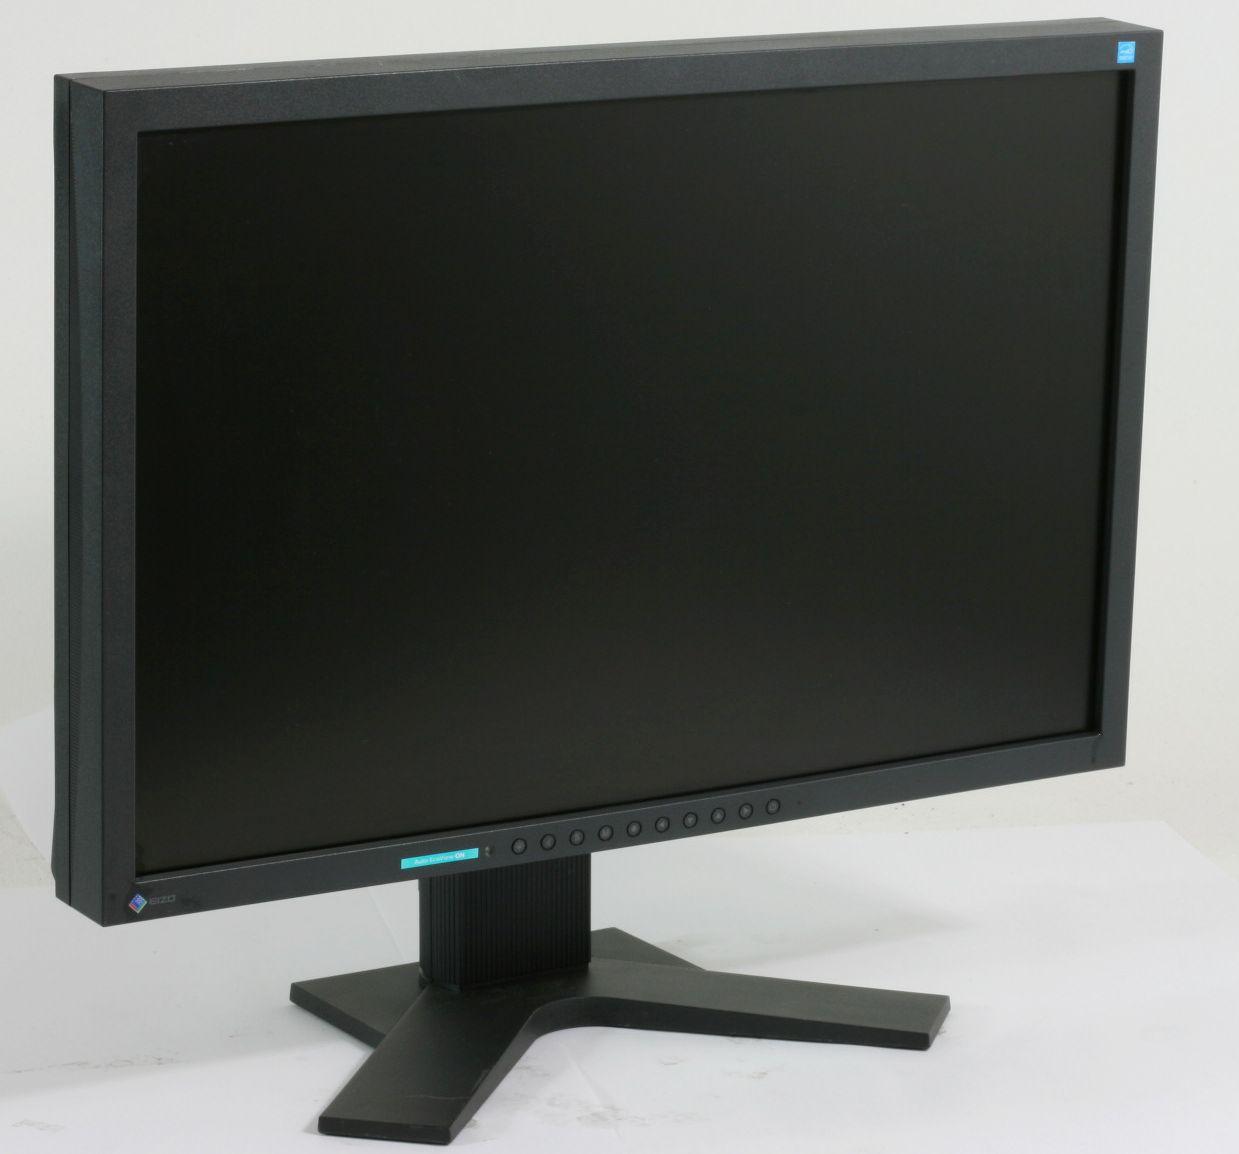 "EIZO FlexScan 22 Zoll Monitor S2202w LCD Display 22"" TFT gebraucht"